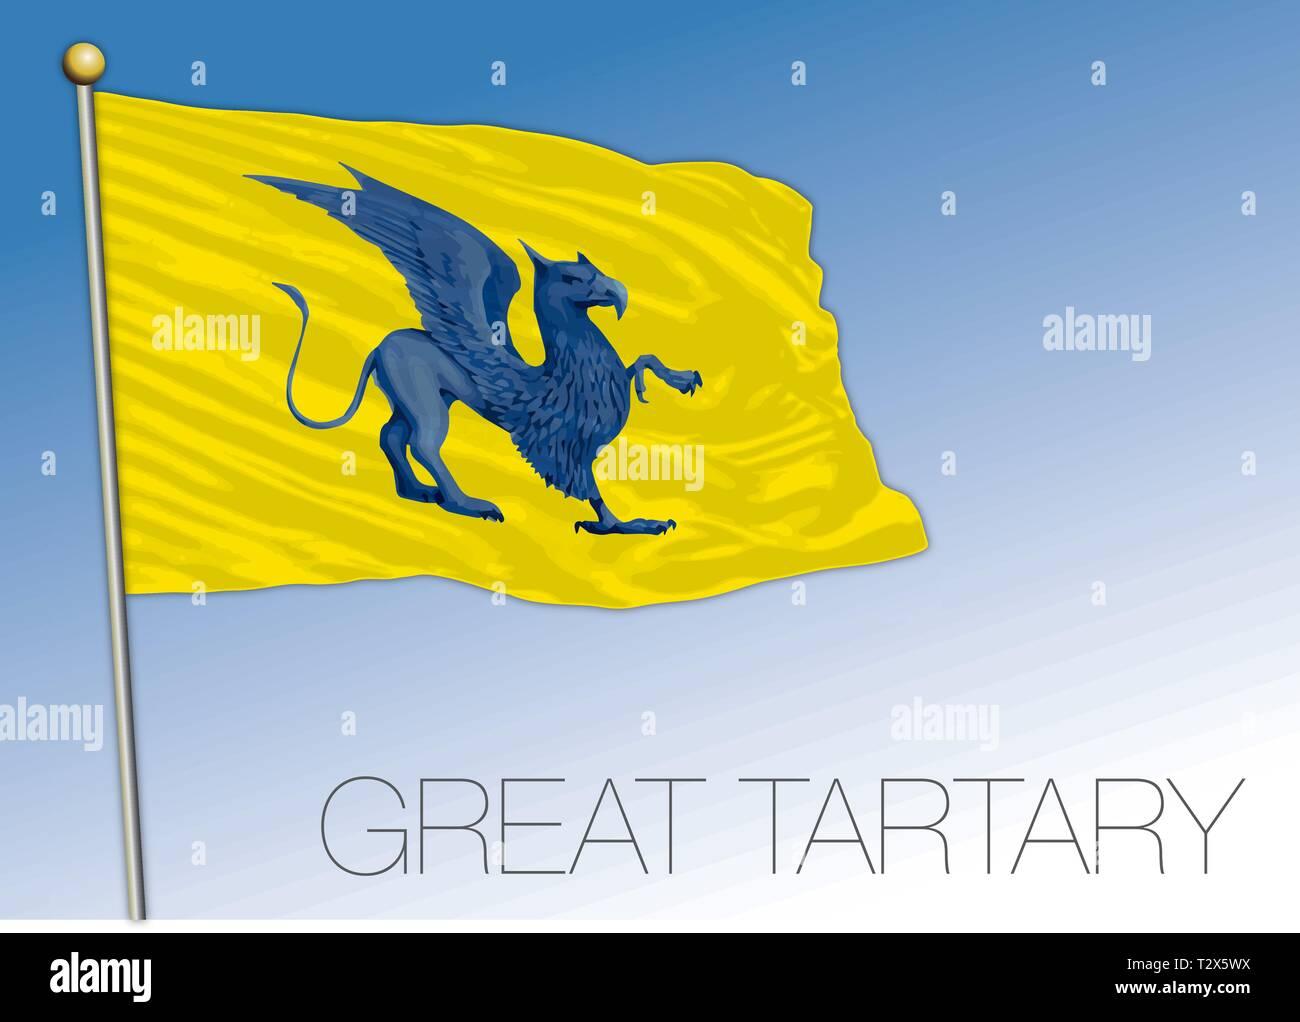 Great Tartary historical flag, eurasia - Stock Image